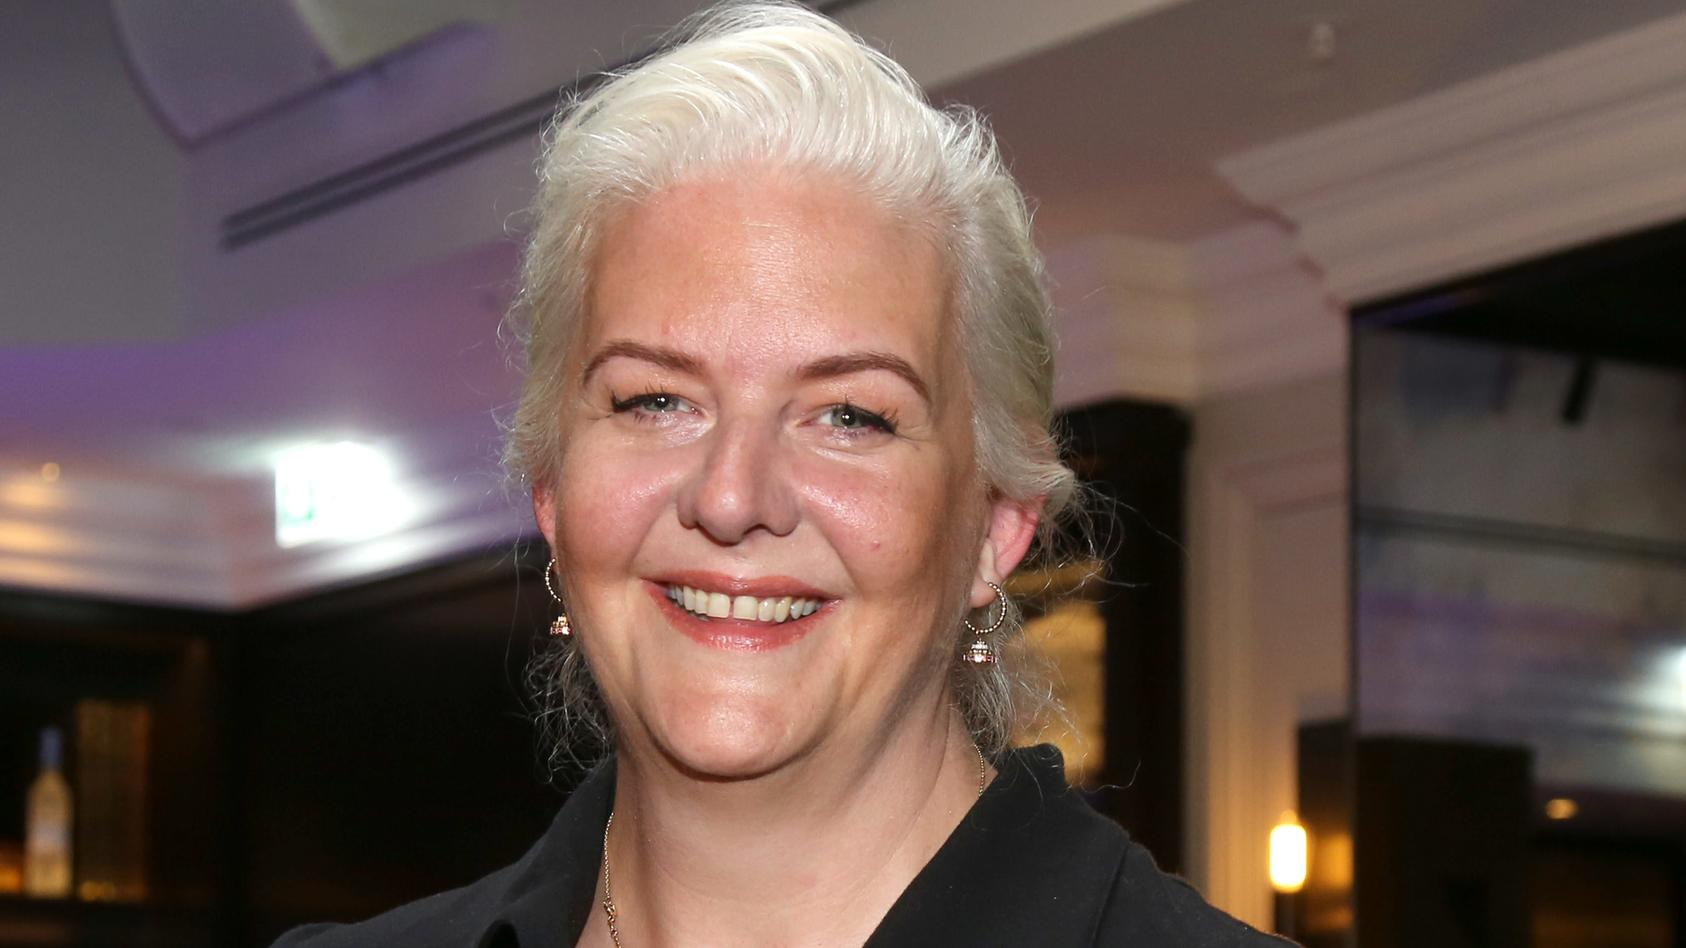 Bettina Schliephake-Burchardt ist Konditormeisterin, Buchautorin und TV-Jurorin.